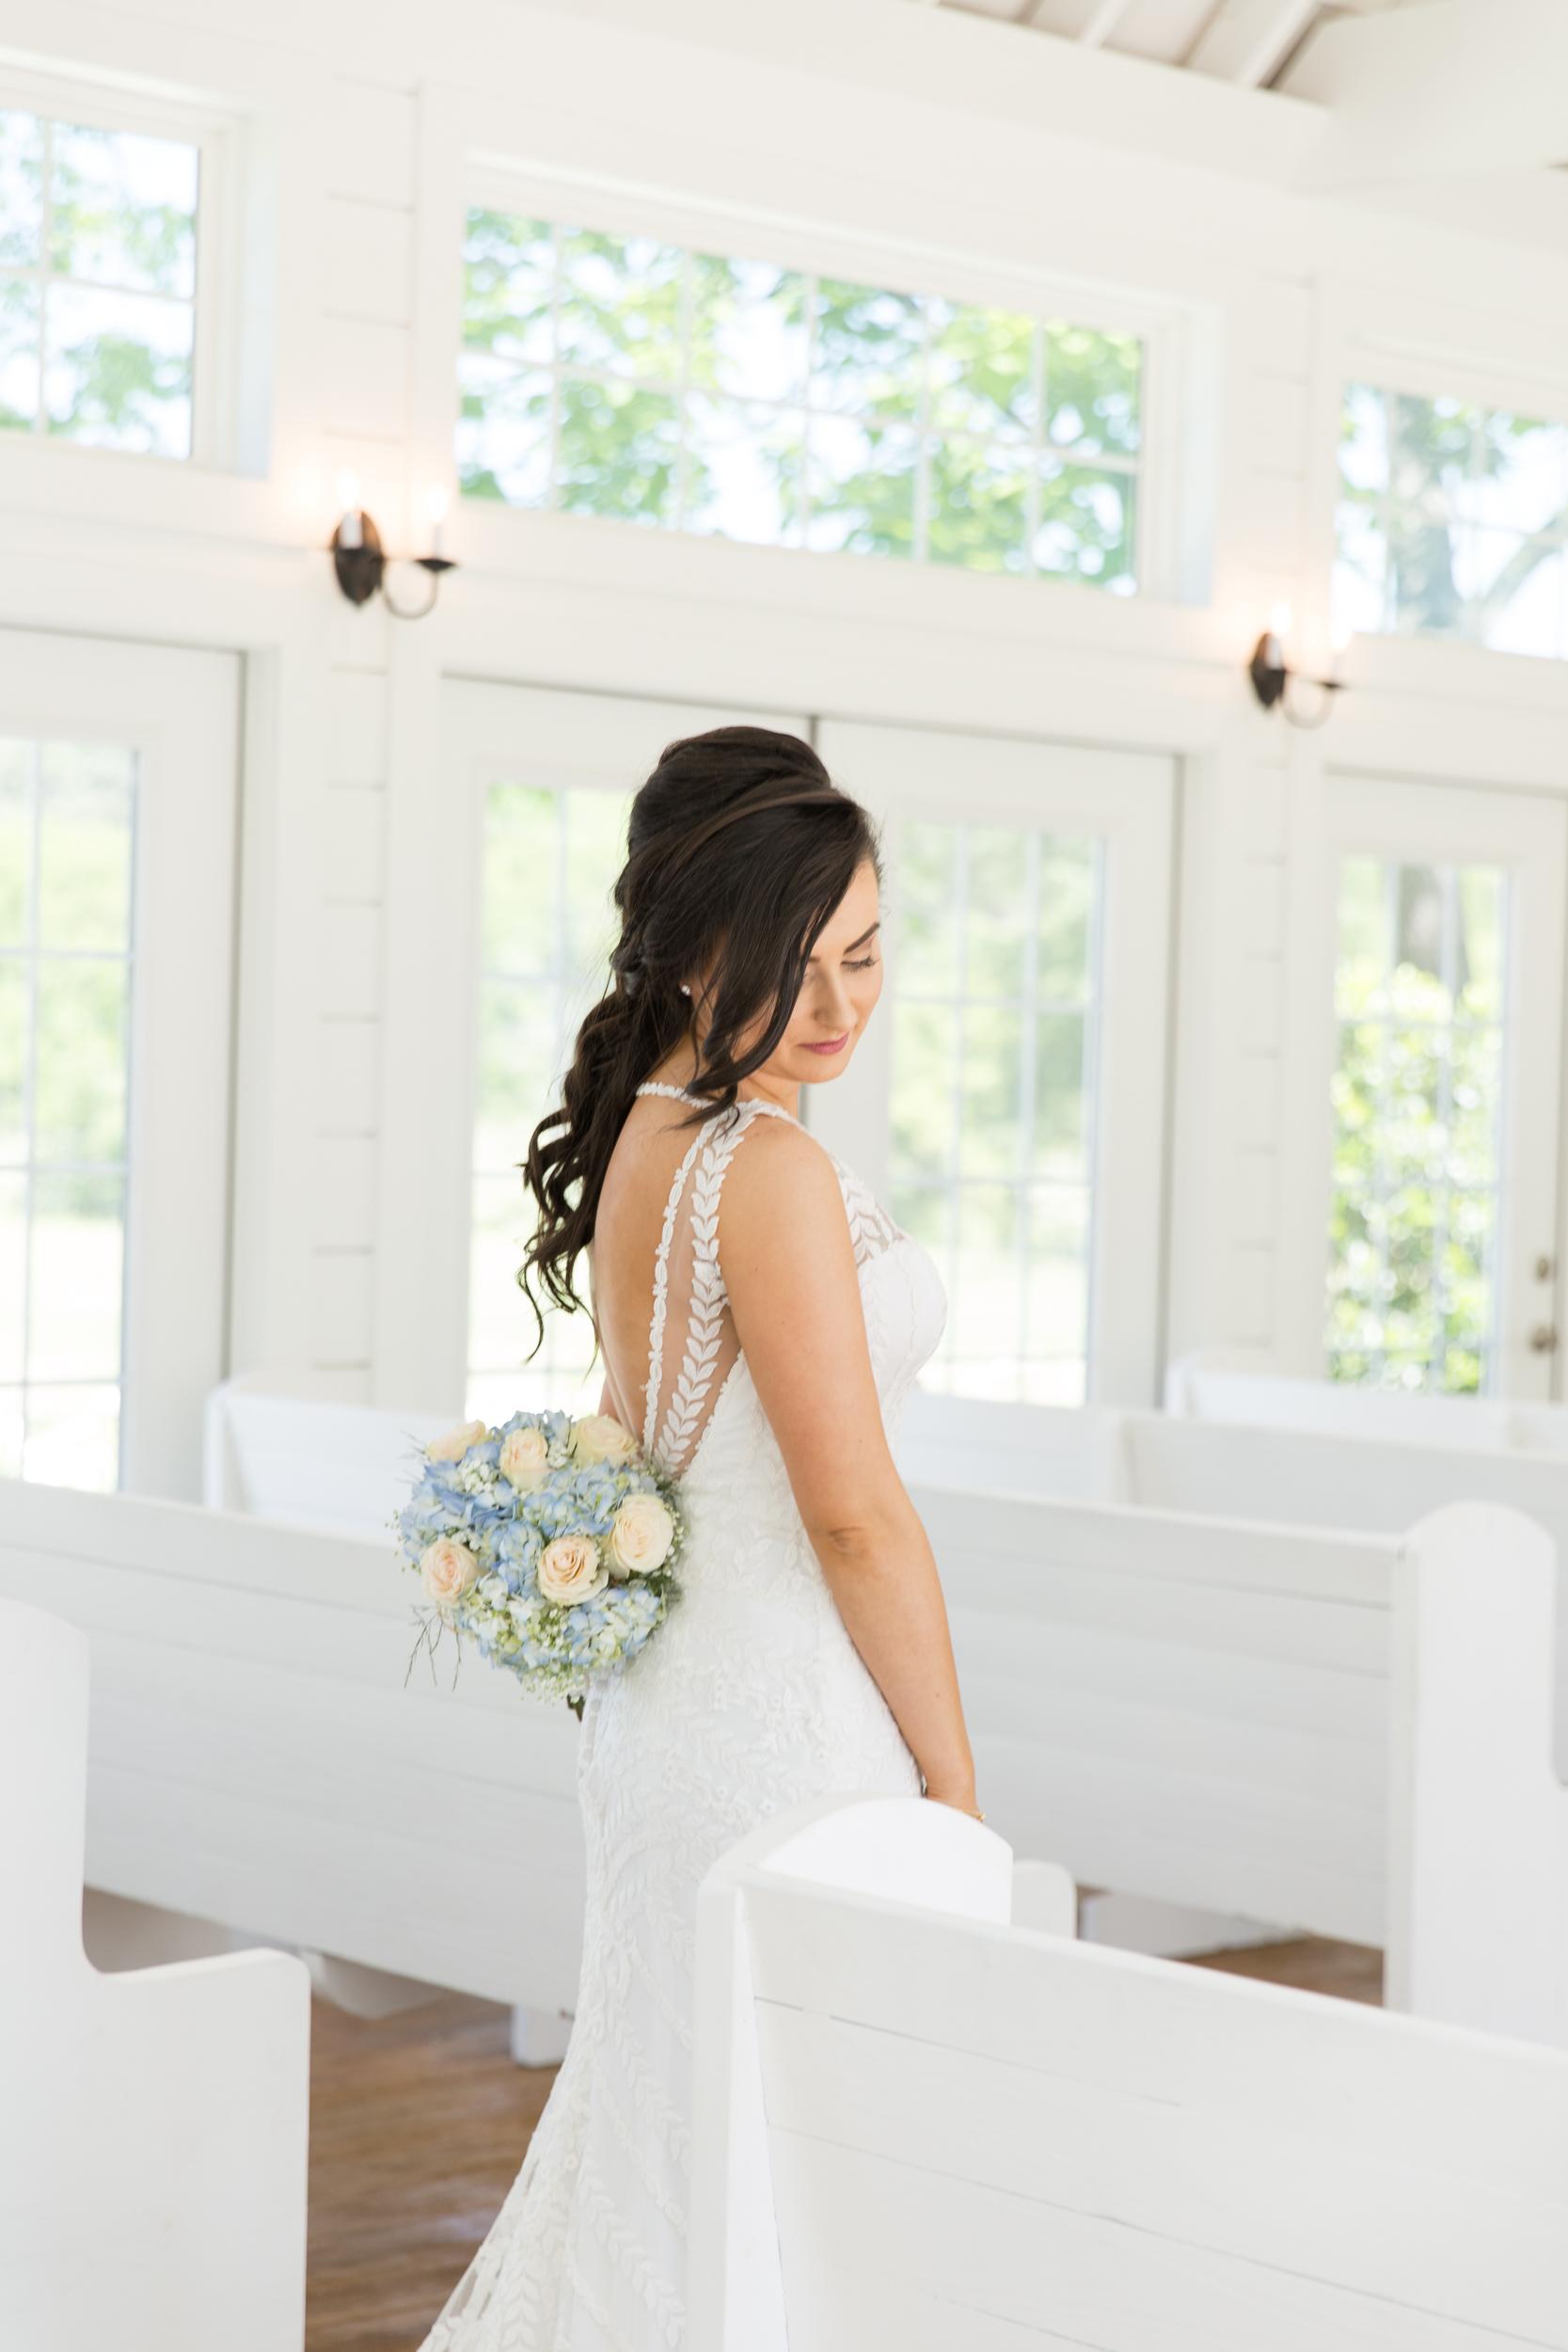 Zihlman-East TX Wedding_Kelsie Hendricks Photography_The Folmar Tyler Texas-24.jpg